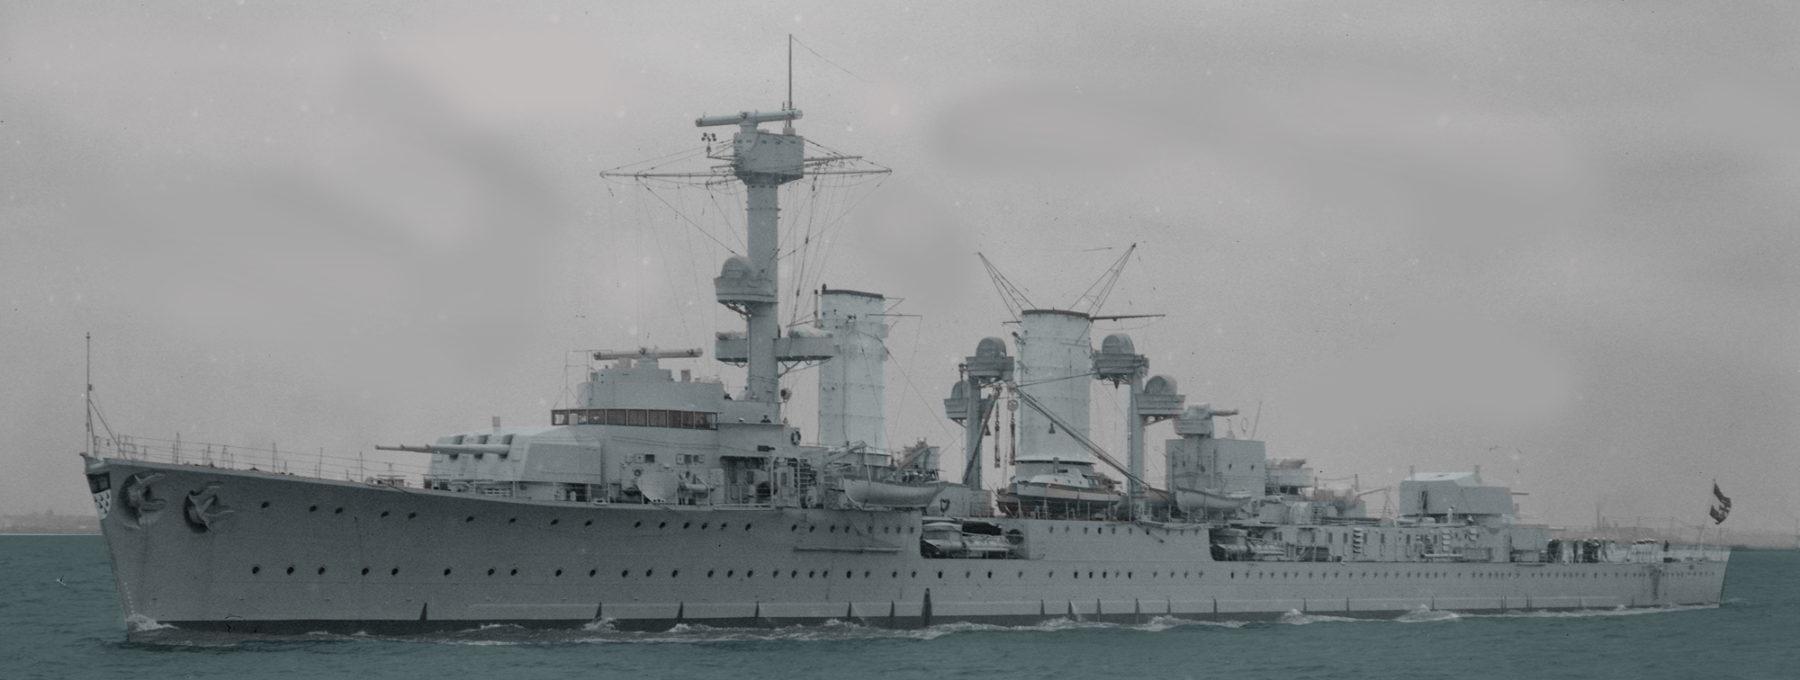 Königsberg class cruisers